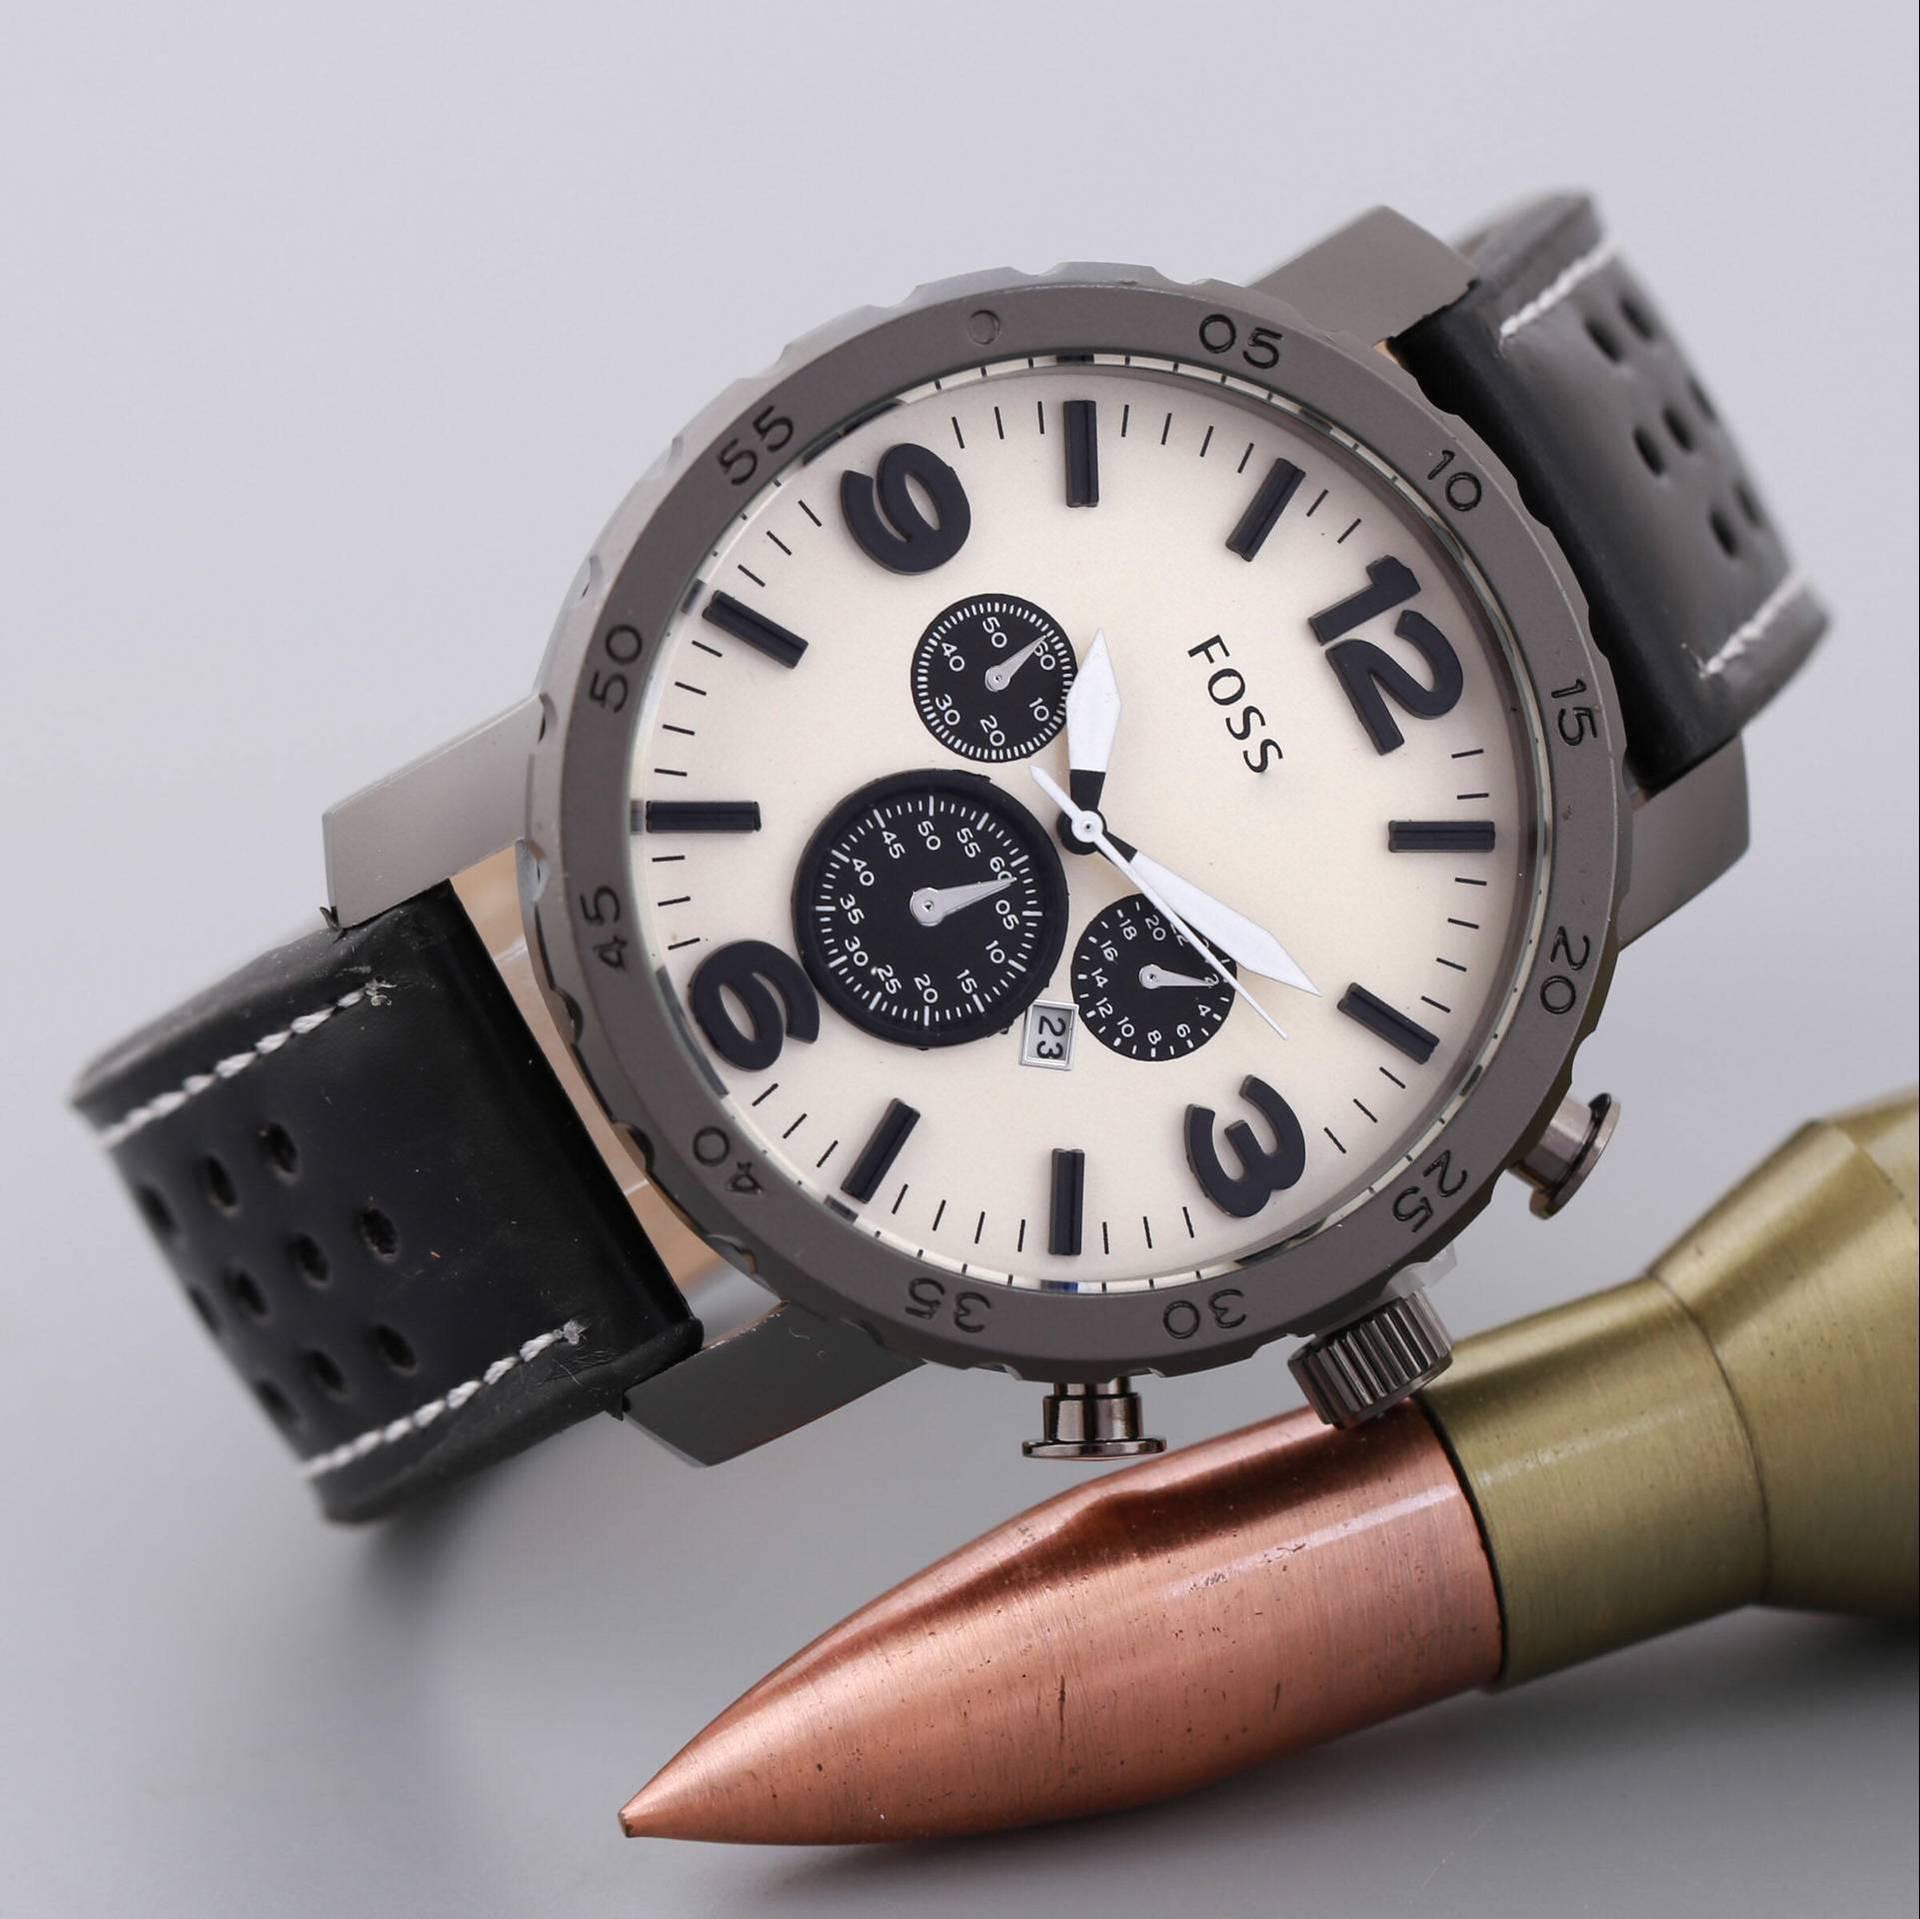 pulseira relógio de quartzo estilo casual calendário relógio de moda masculino